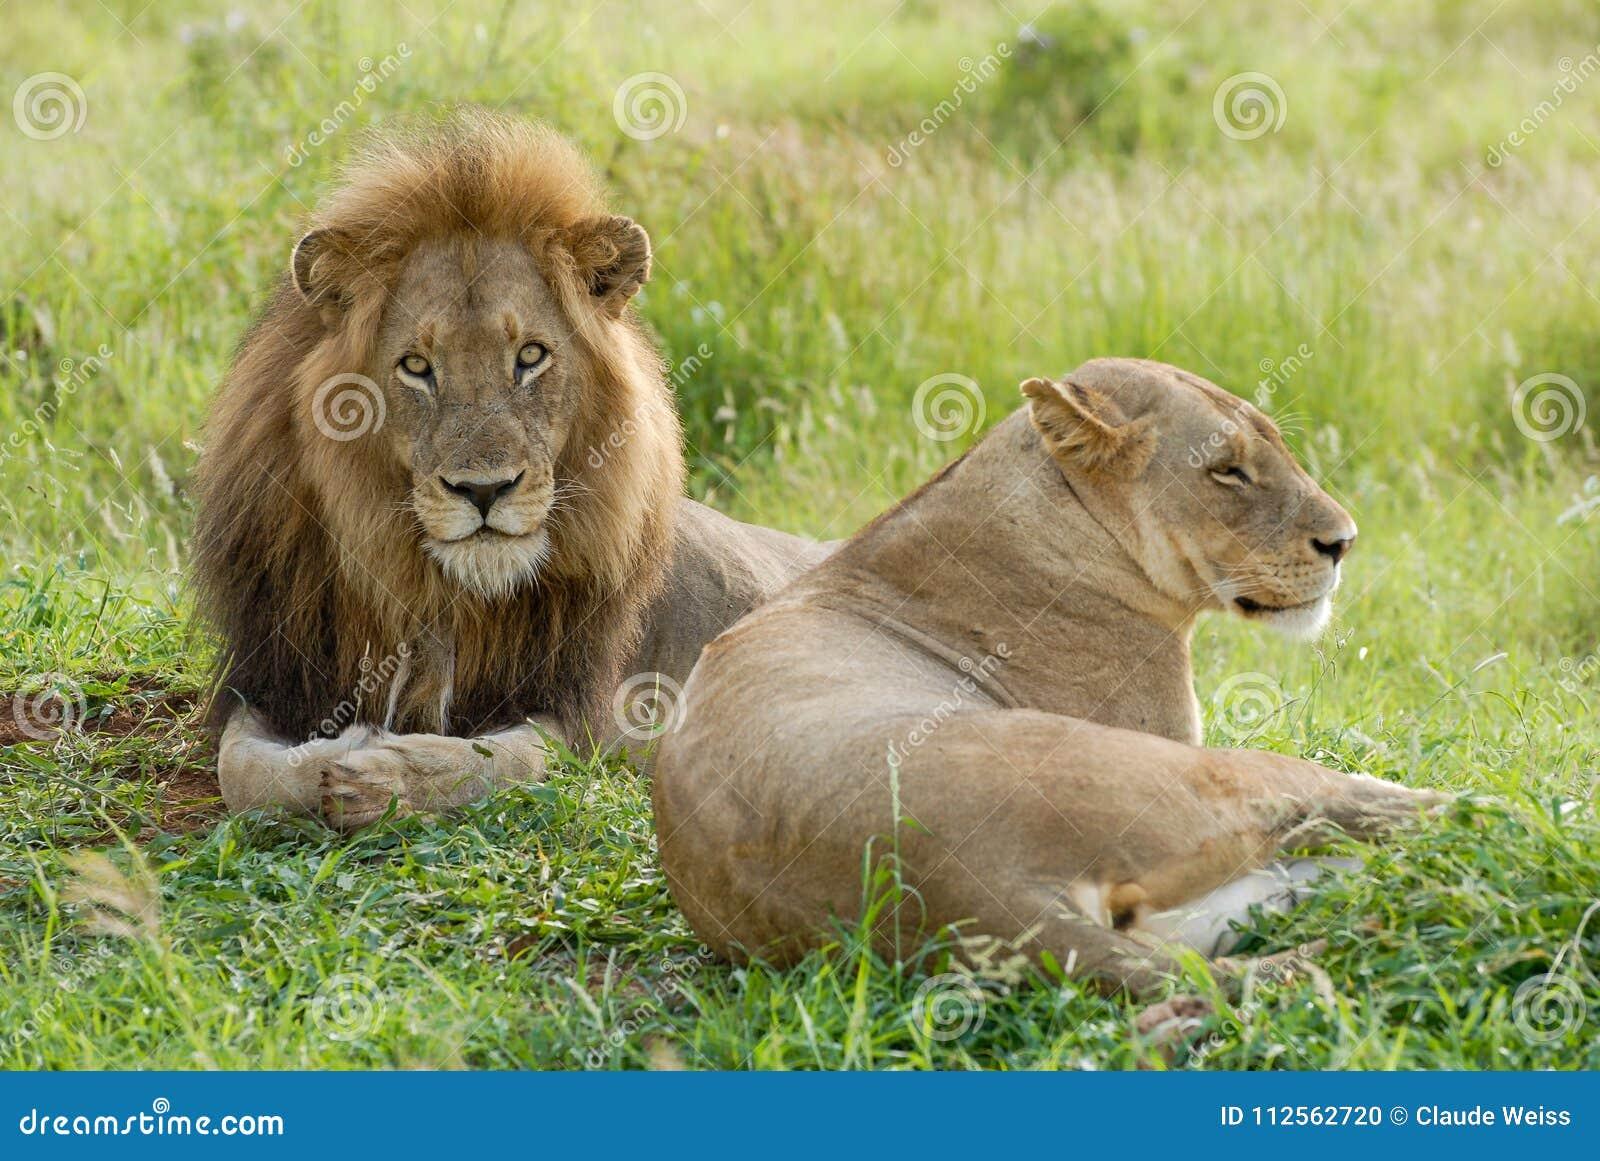 La melena del leona